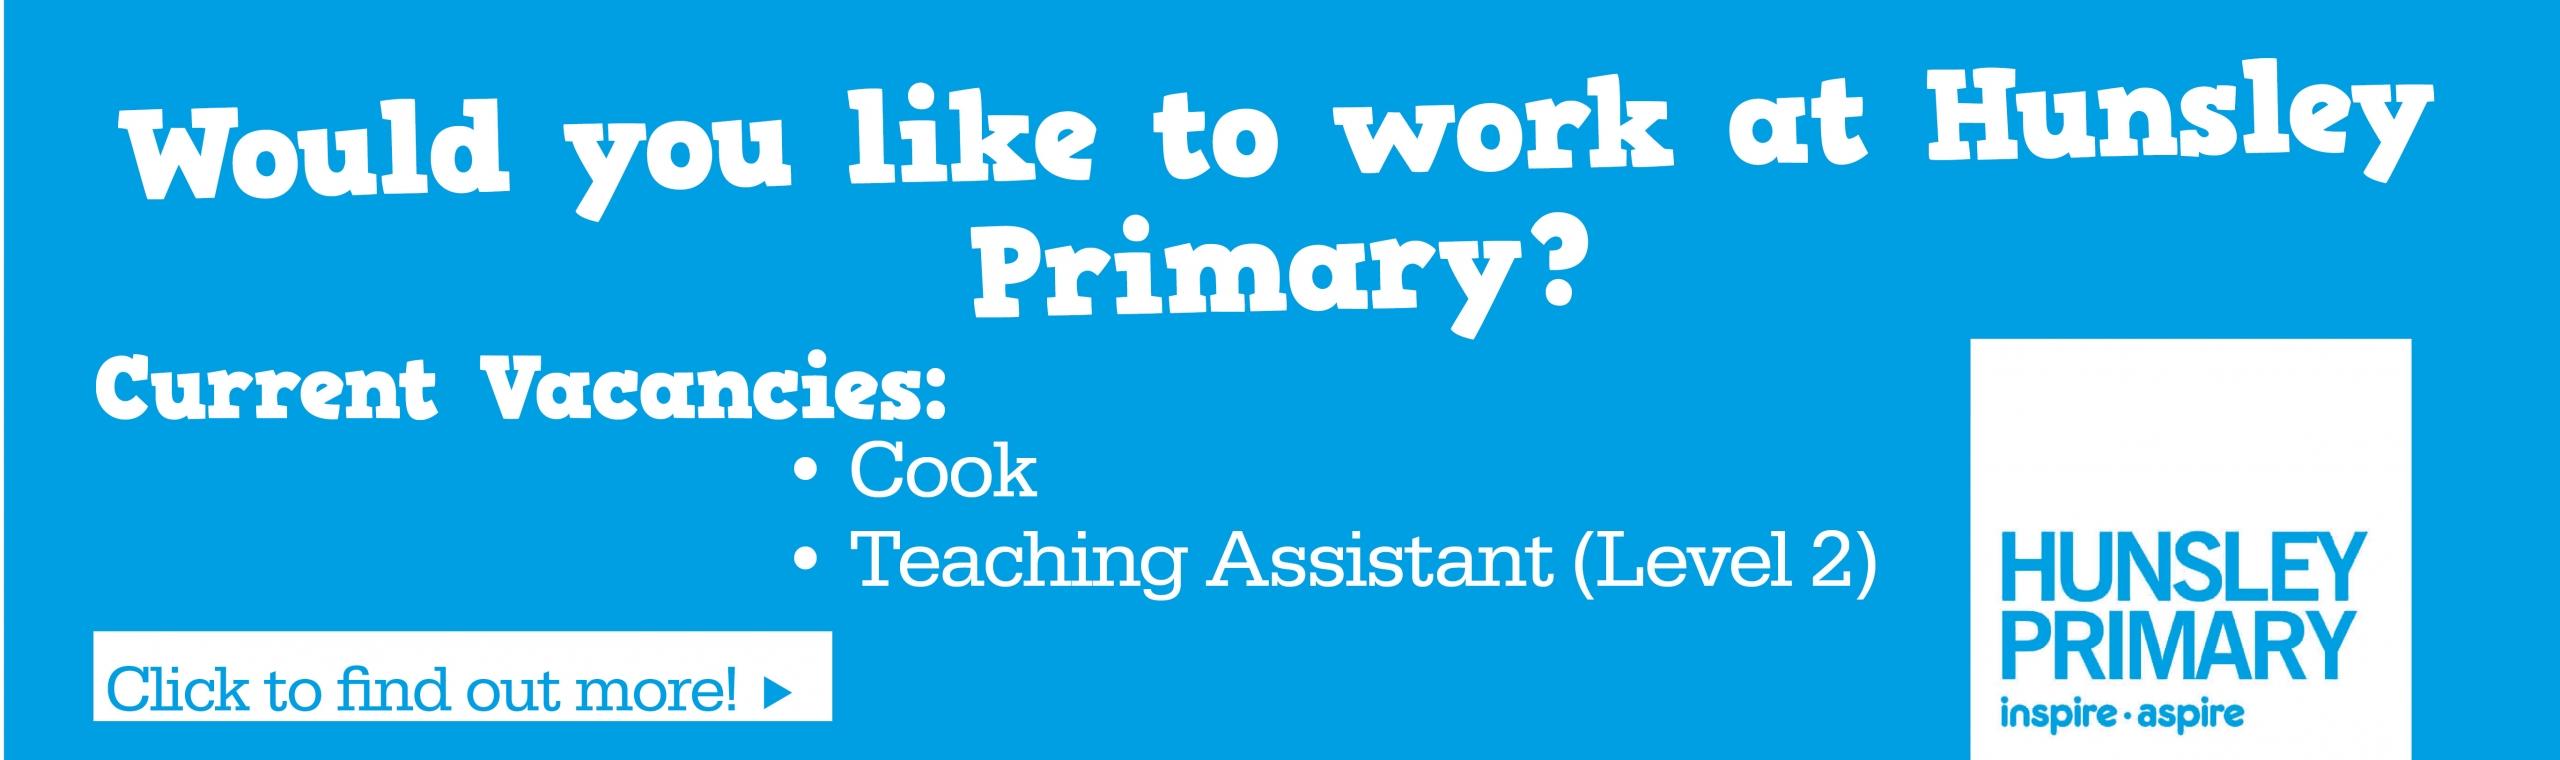 Hunsley_Primary_Banner – Current Vacancies – Cook